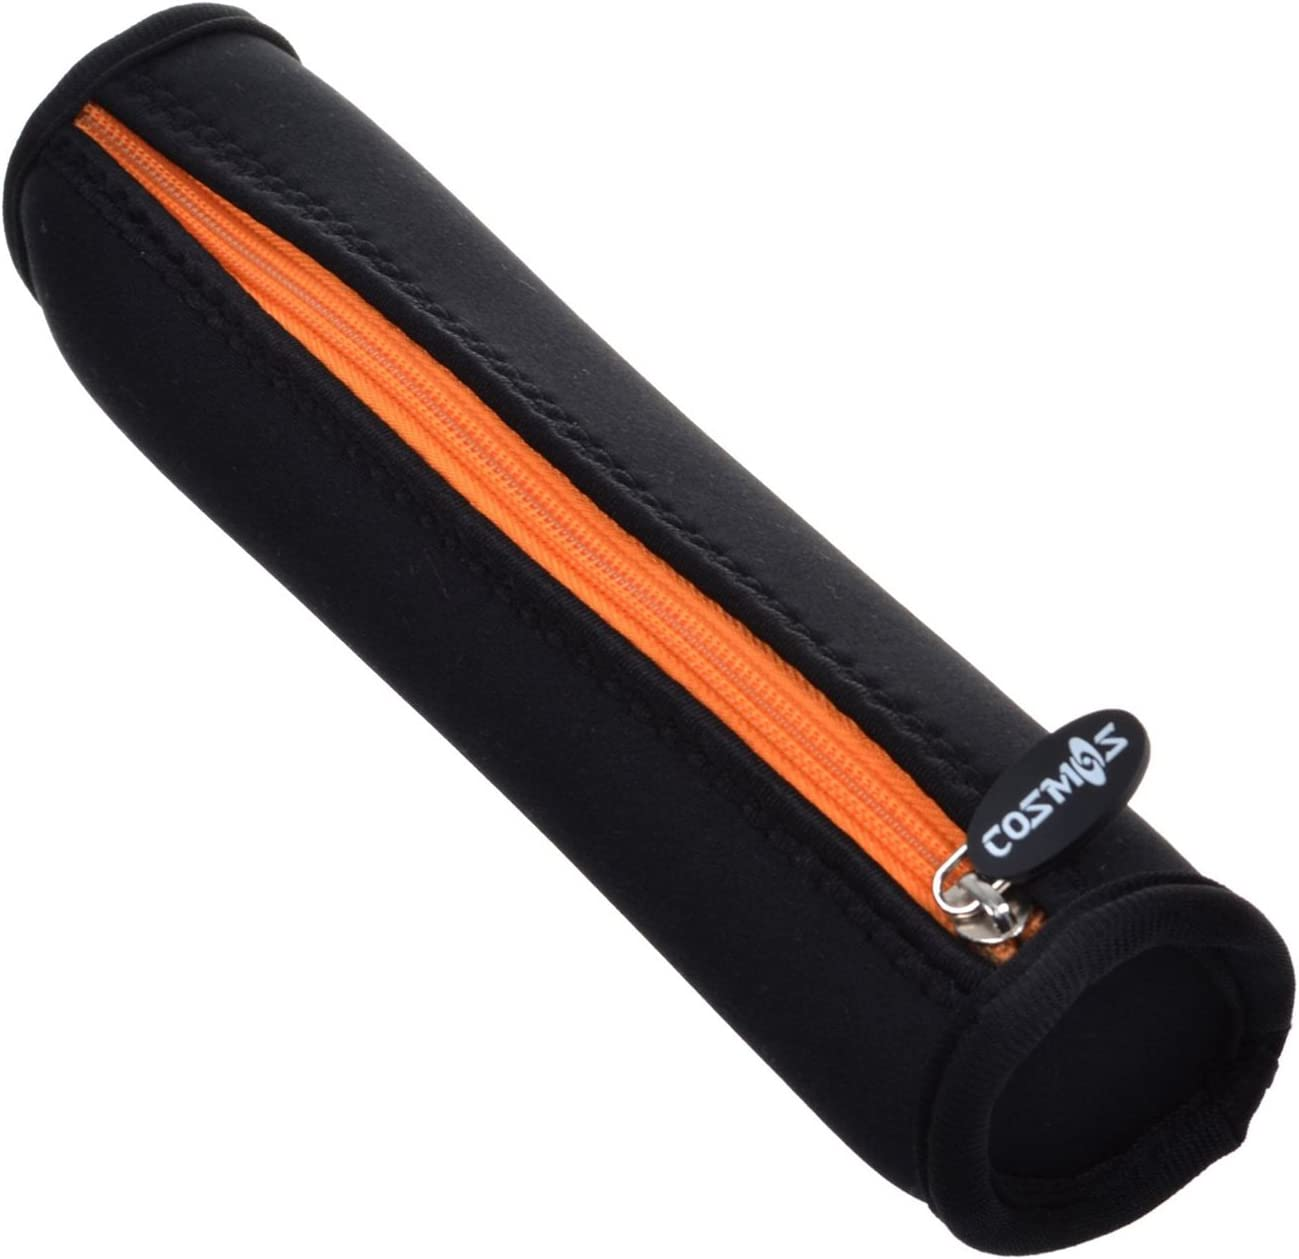 Cosmos Black Color with Orange Zipper Neoprene Stylus Pen Case Holder Pencil Bag Pouch